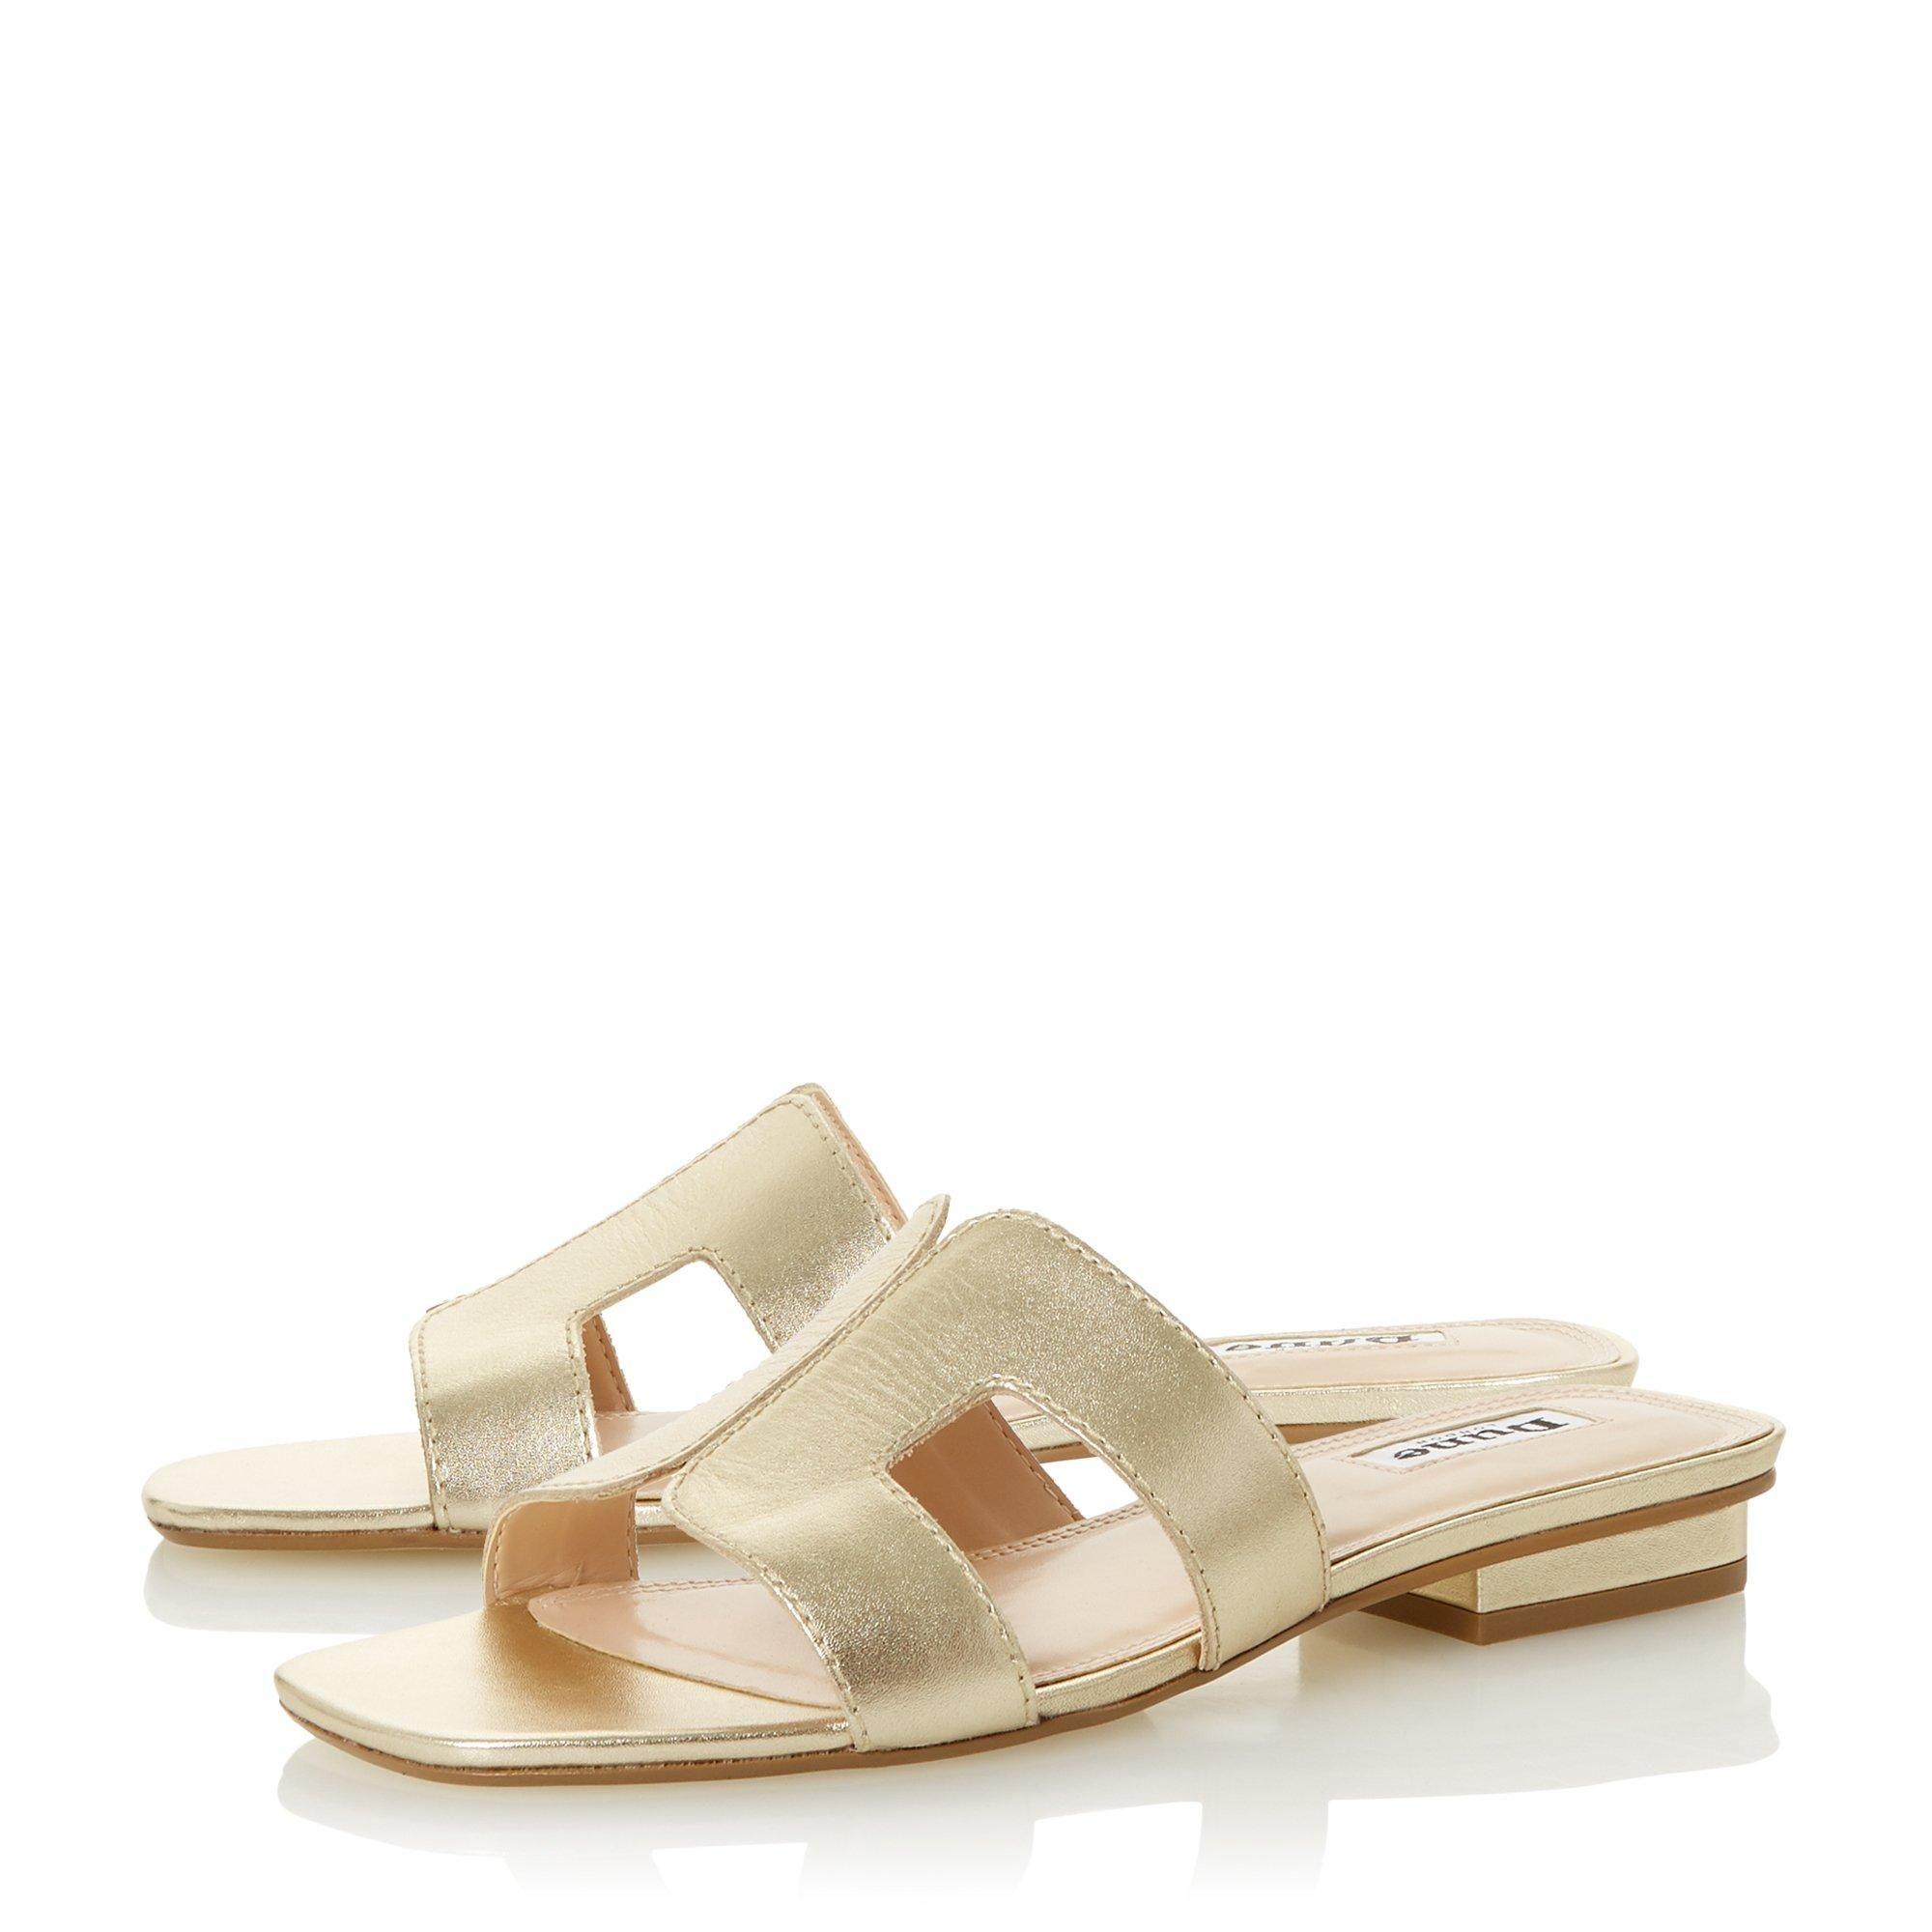 Dune Ladies LOUPE Smart Slider Sandals